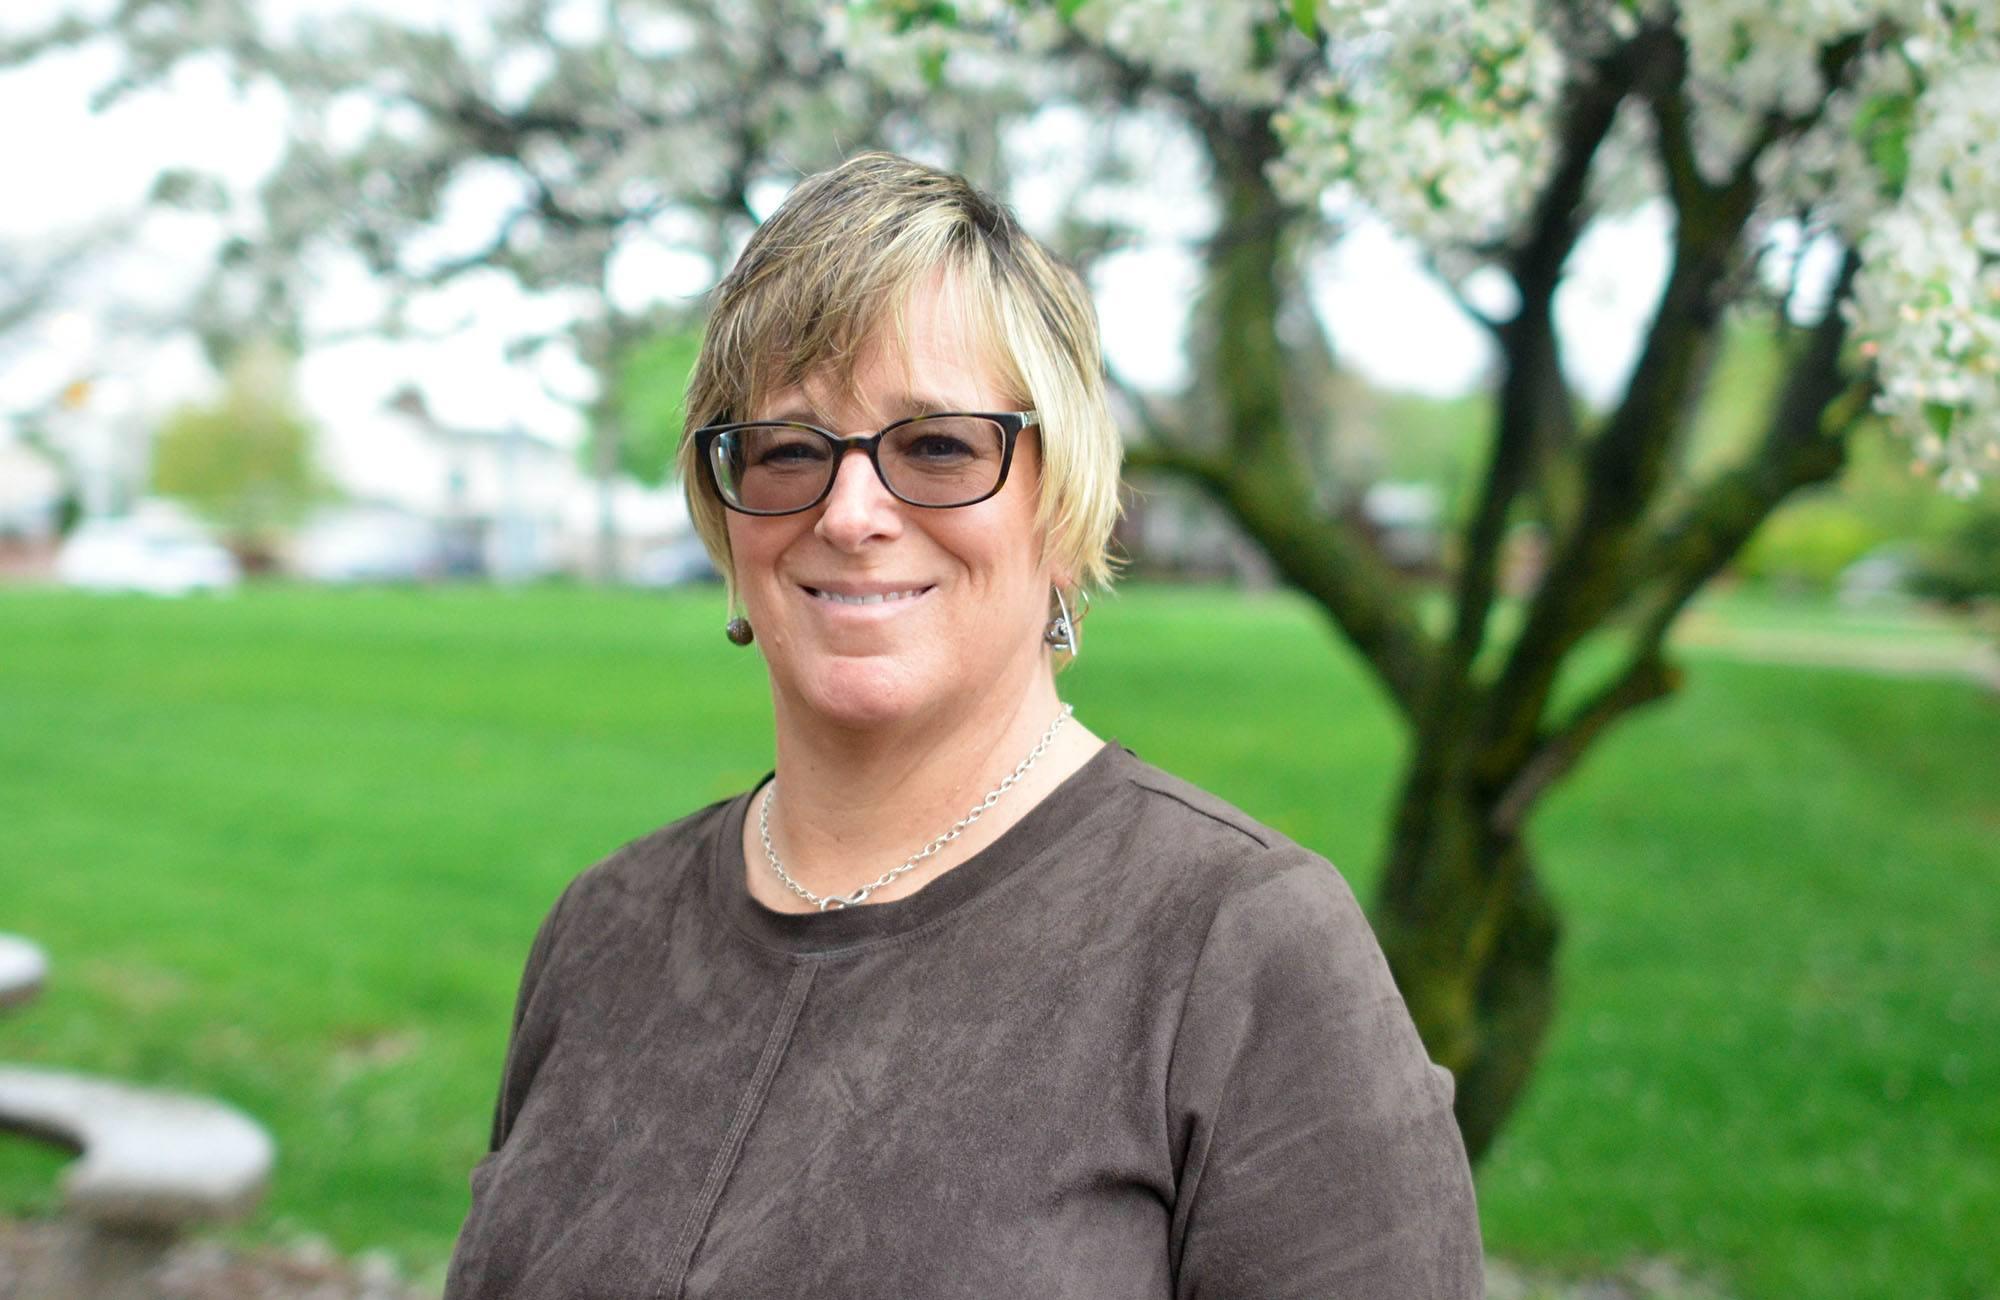 Kay MacConnachie, Occupational Therapist